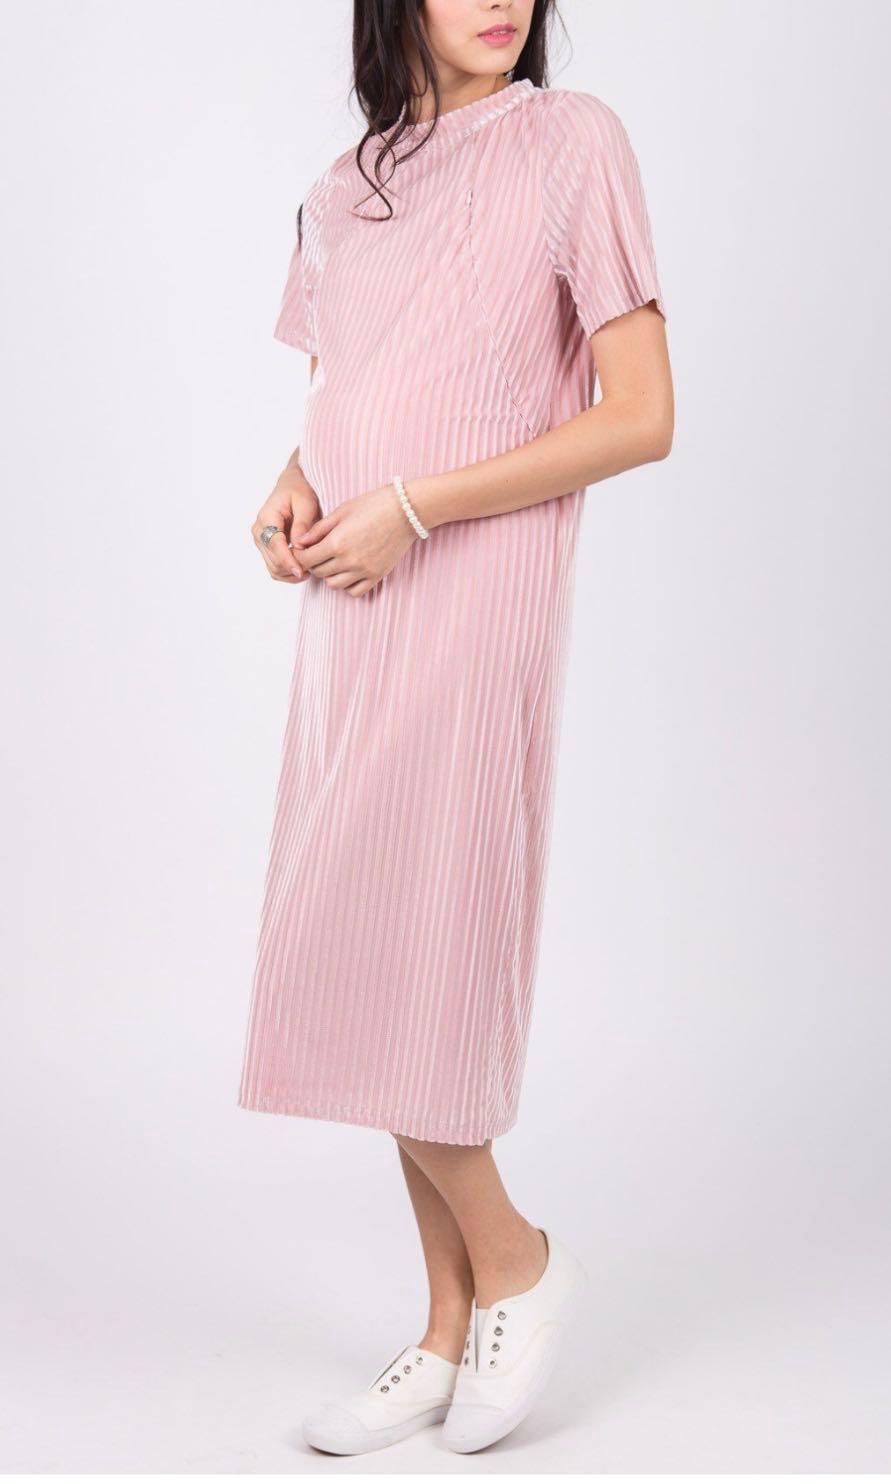 d9dd5daa6b01f Mothercot Velvet Maternity and Nursing dress, Babies & Kids ...